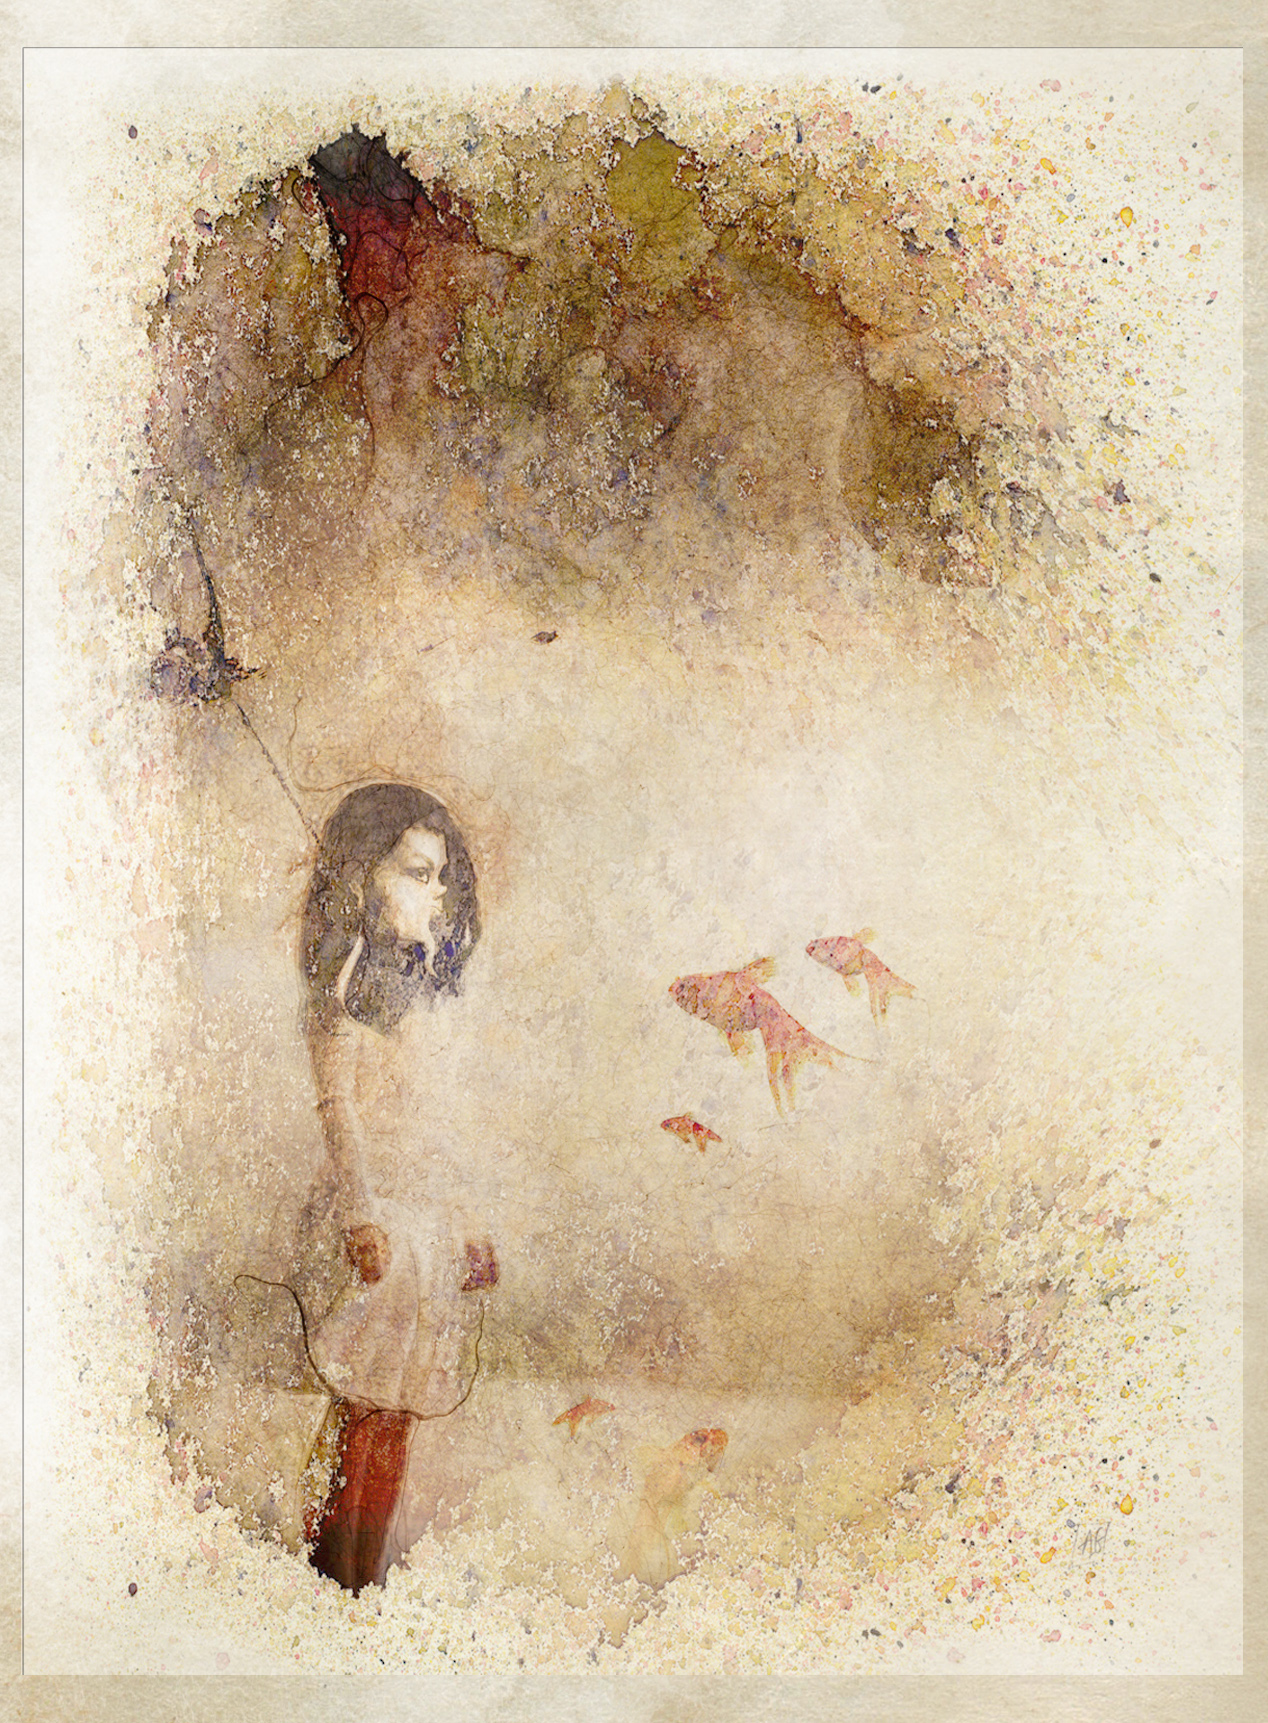 Anthony gabriel Gauci - Alice & Other Works